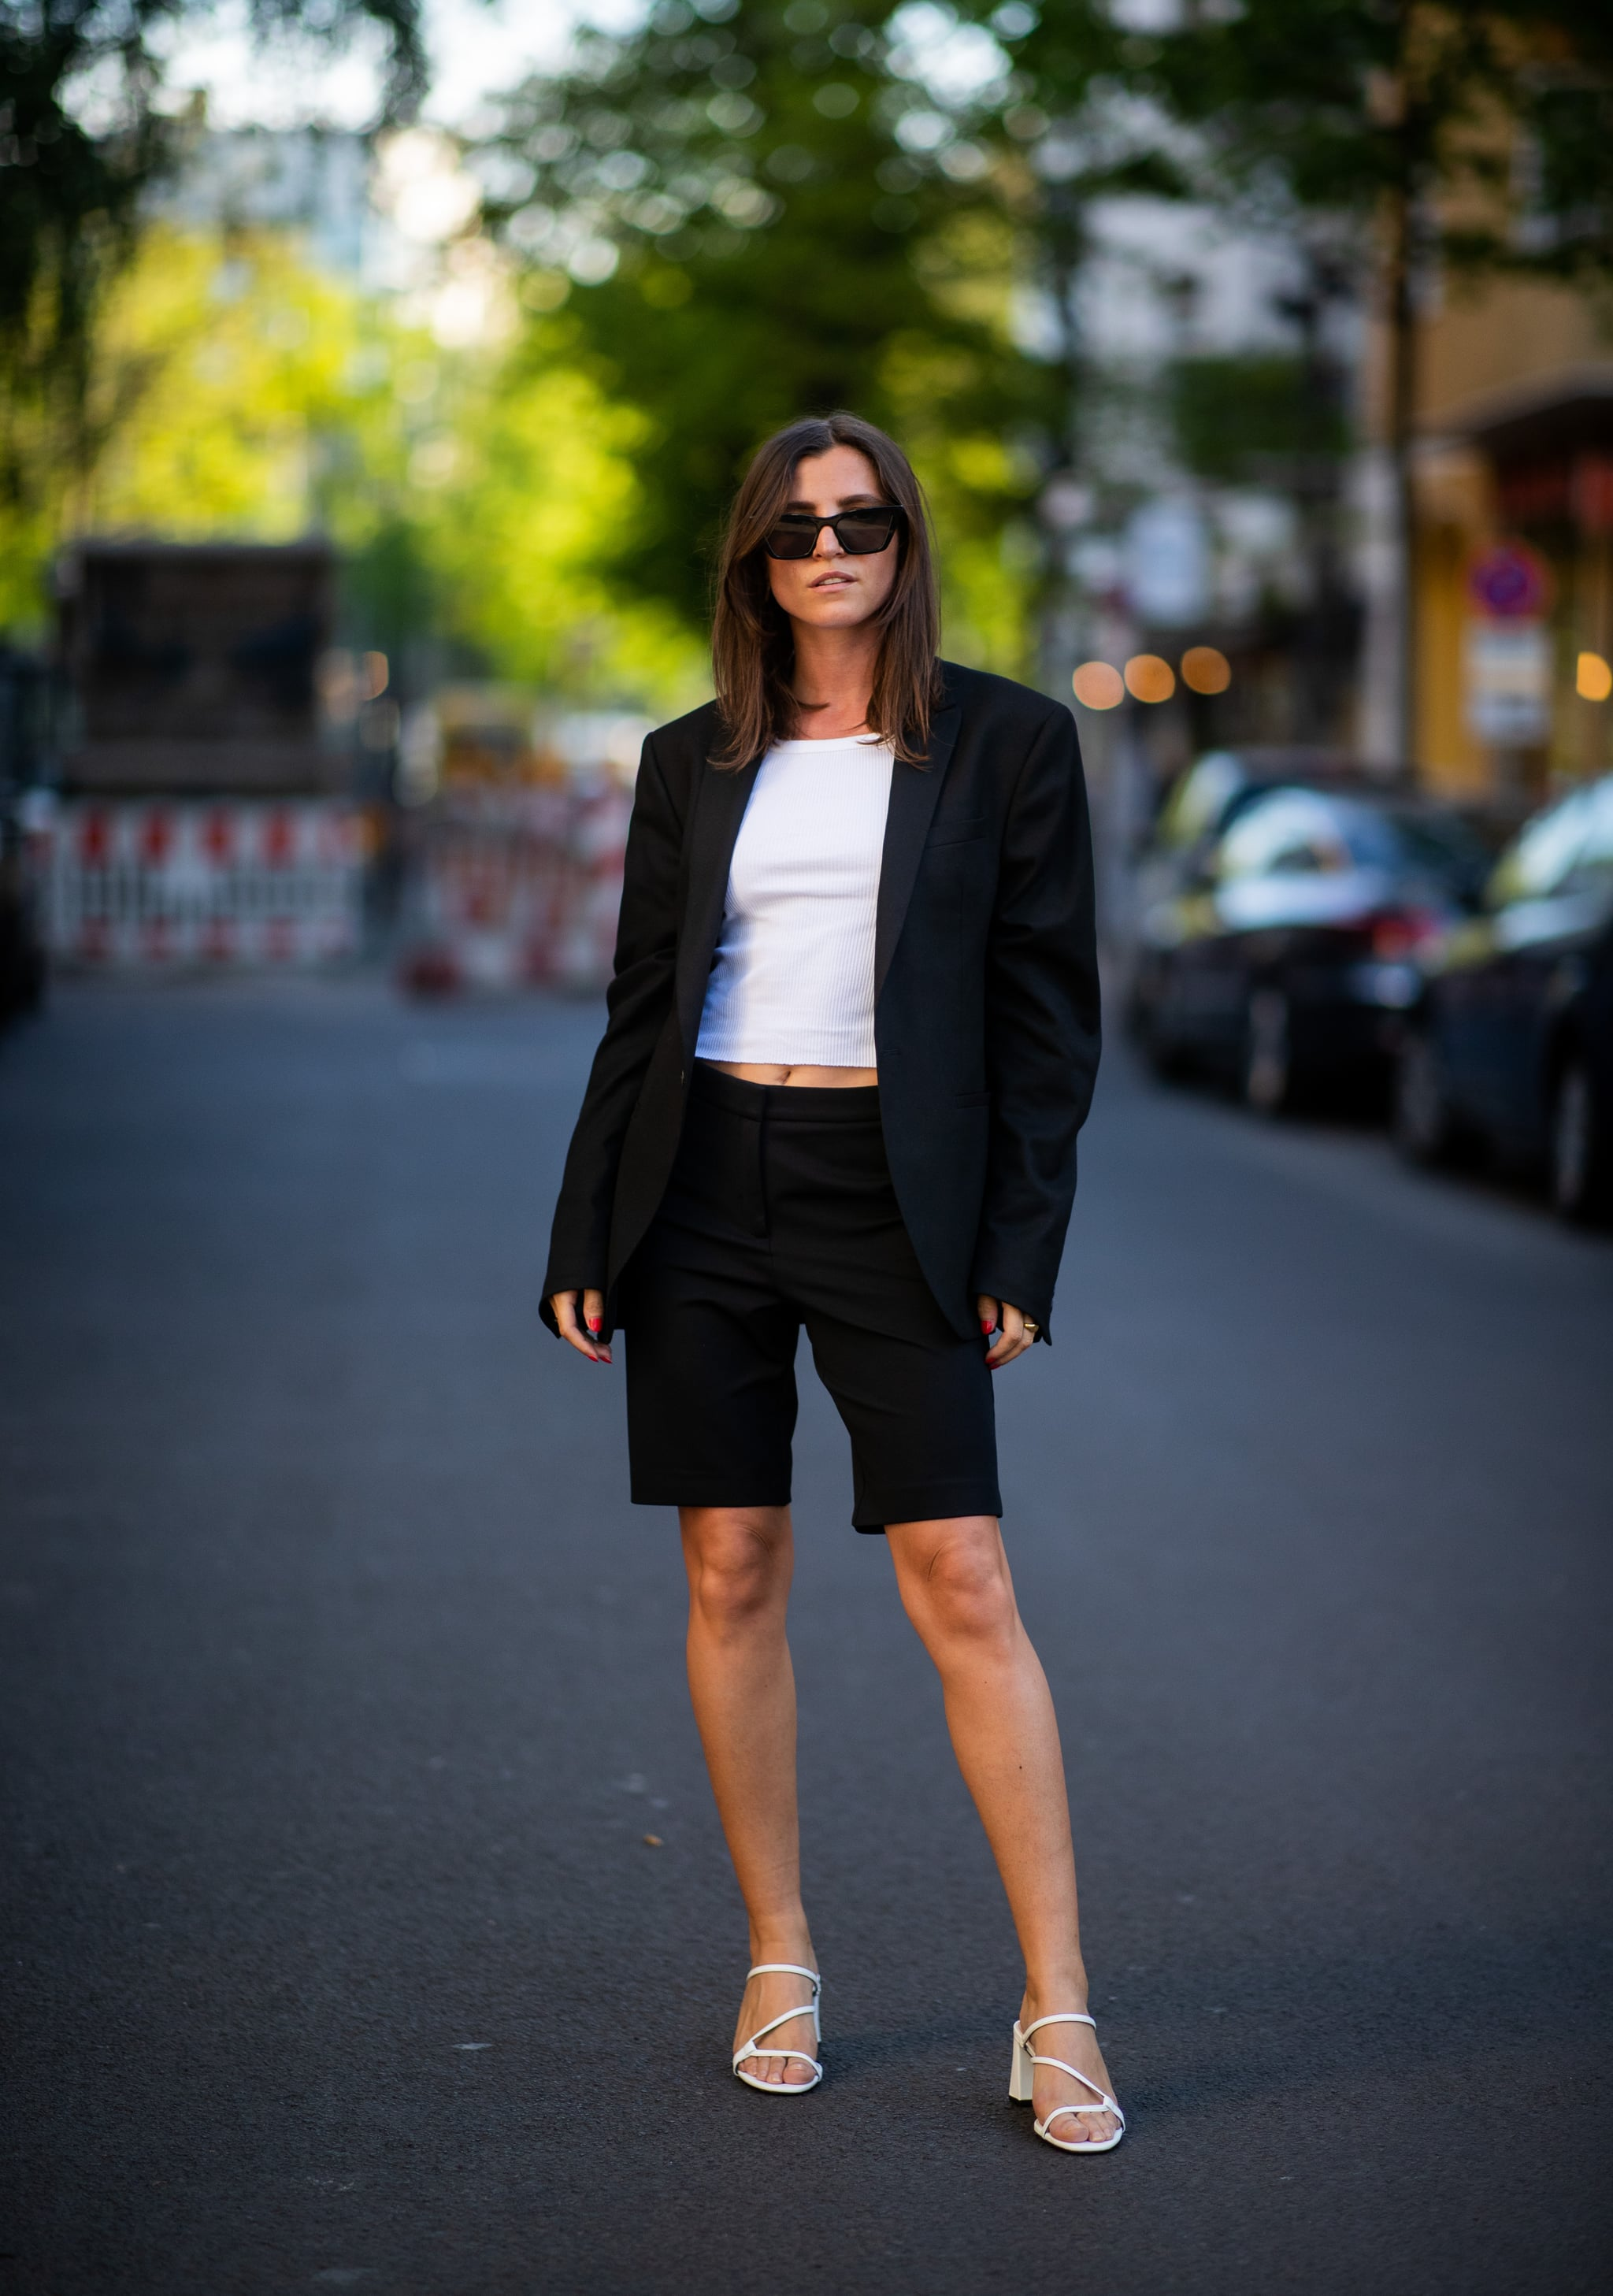 How to Wear a Blazer and Shorts | POPSUGAR Fashion